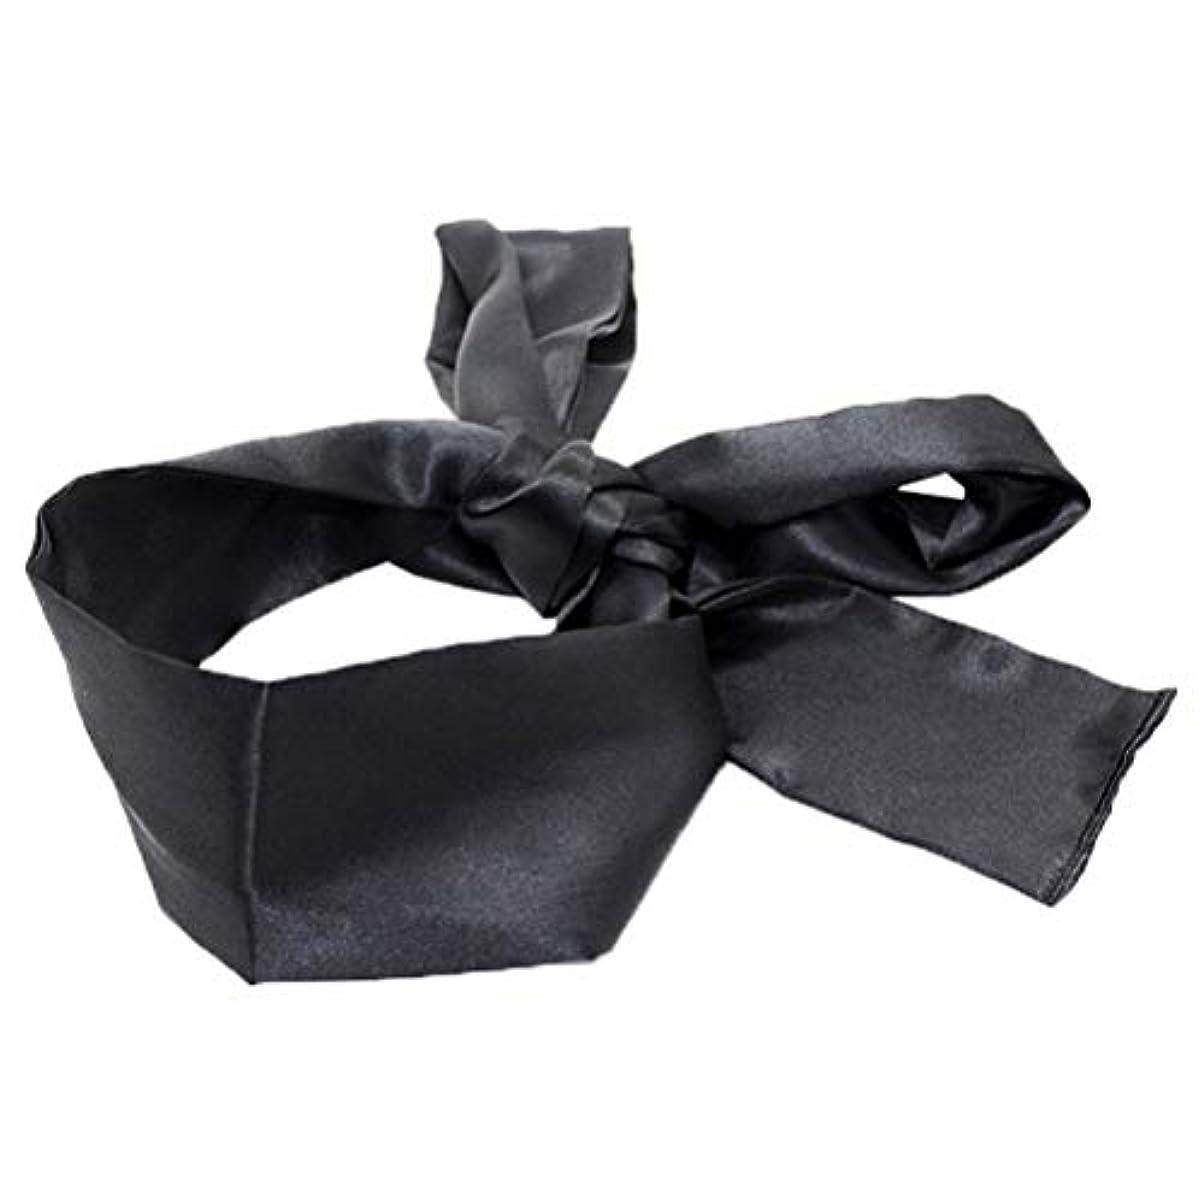 HEALIFTY 睡眠マスクホームトラベルコスチューム小道具(ブラック)用サテン目隠しソフト快適なアイマスクバンドブラインダー